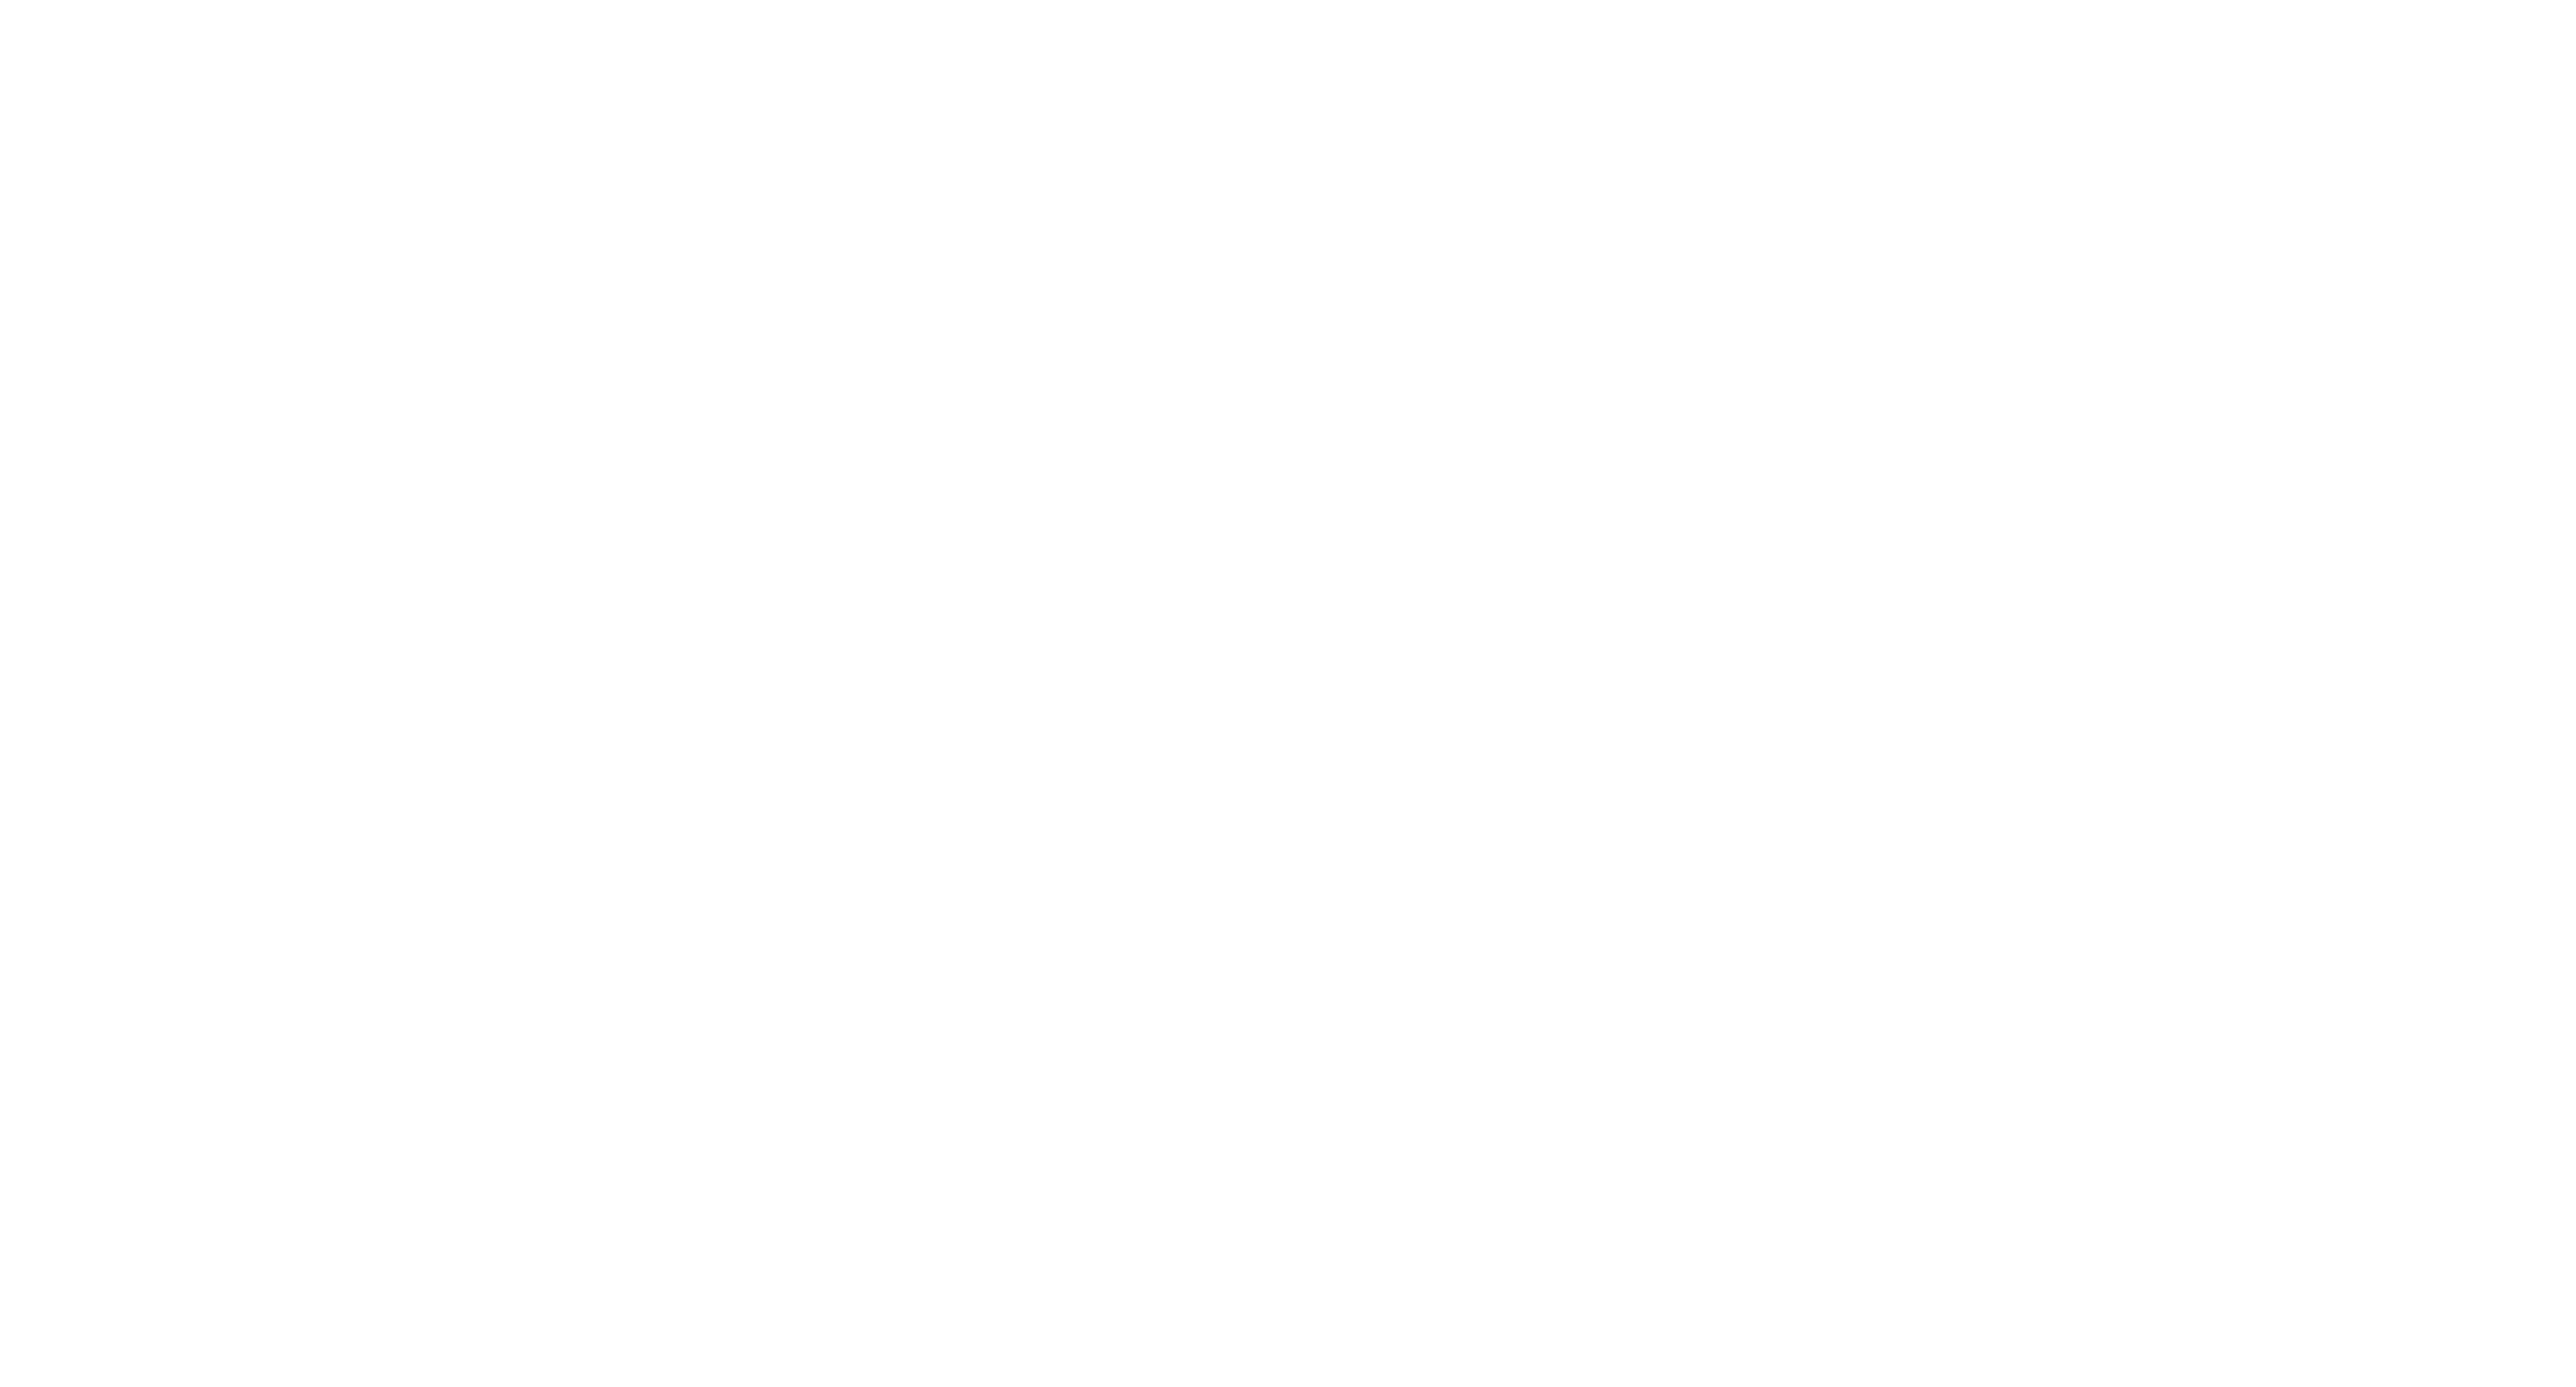 Go On Yhtiöt -logo